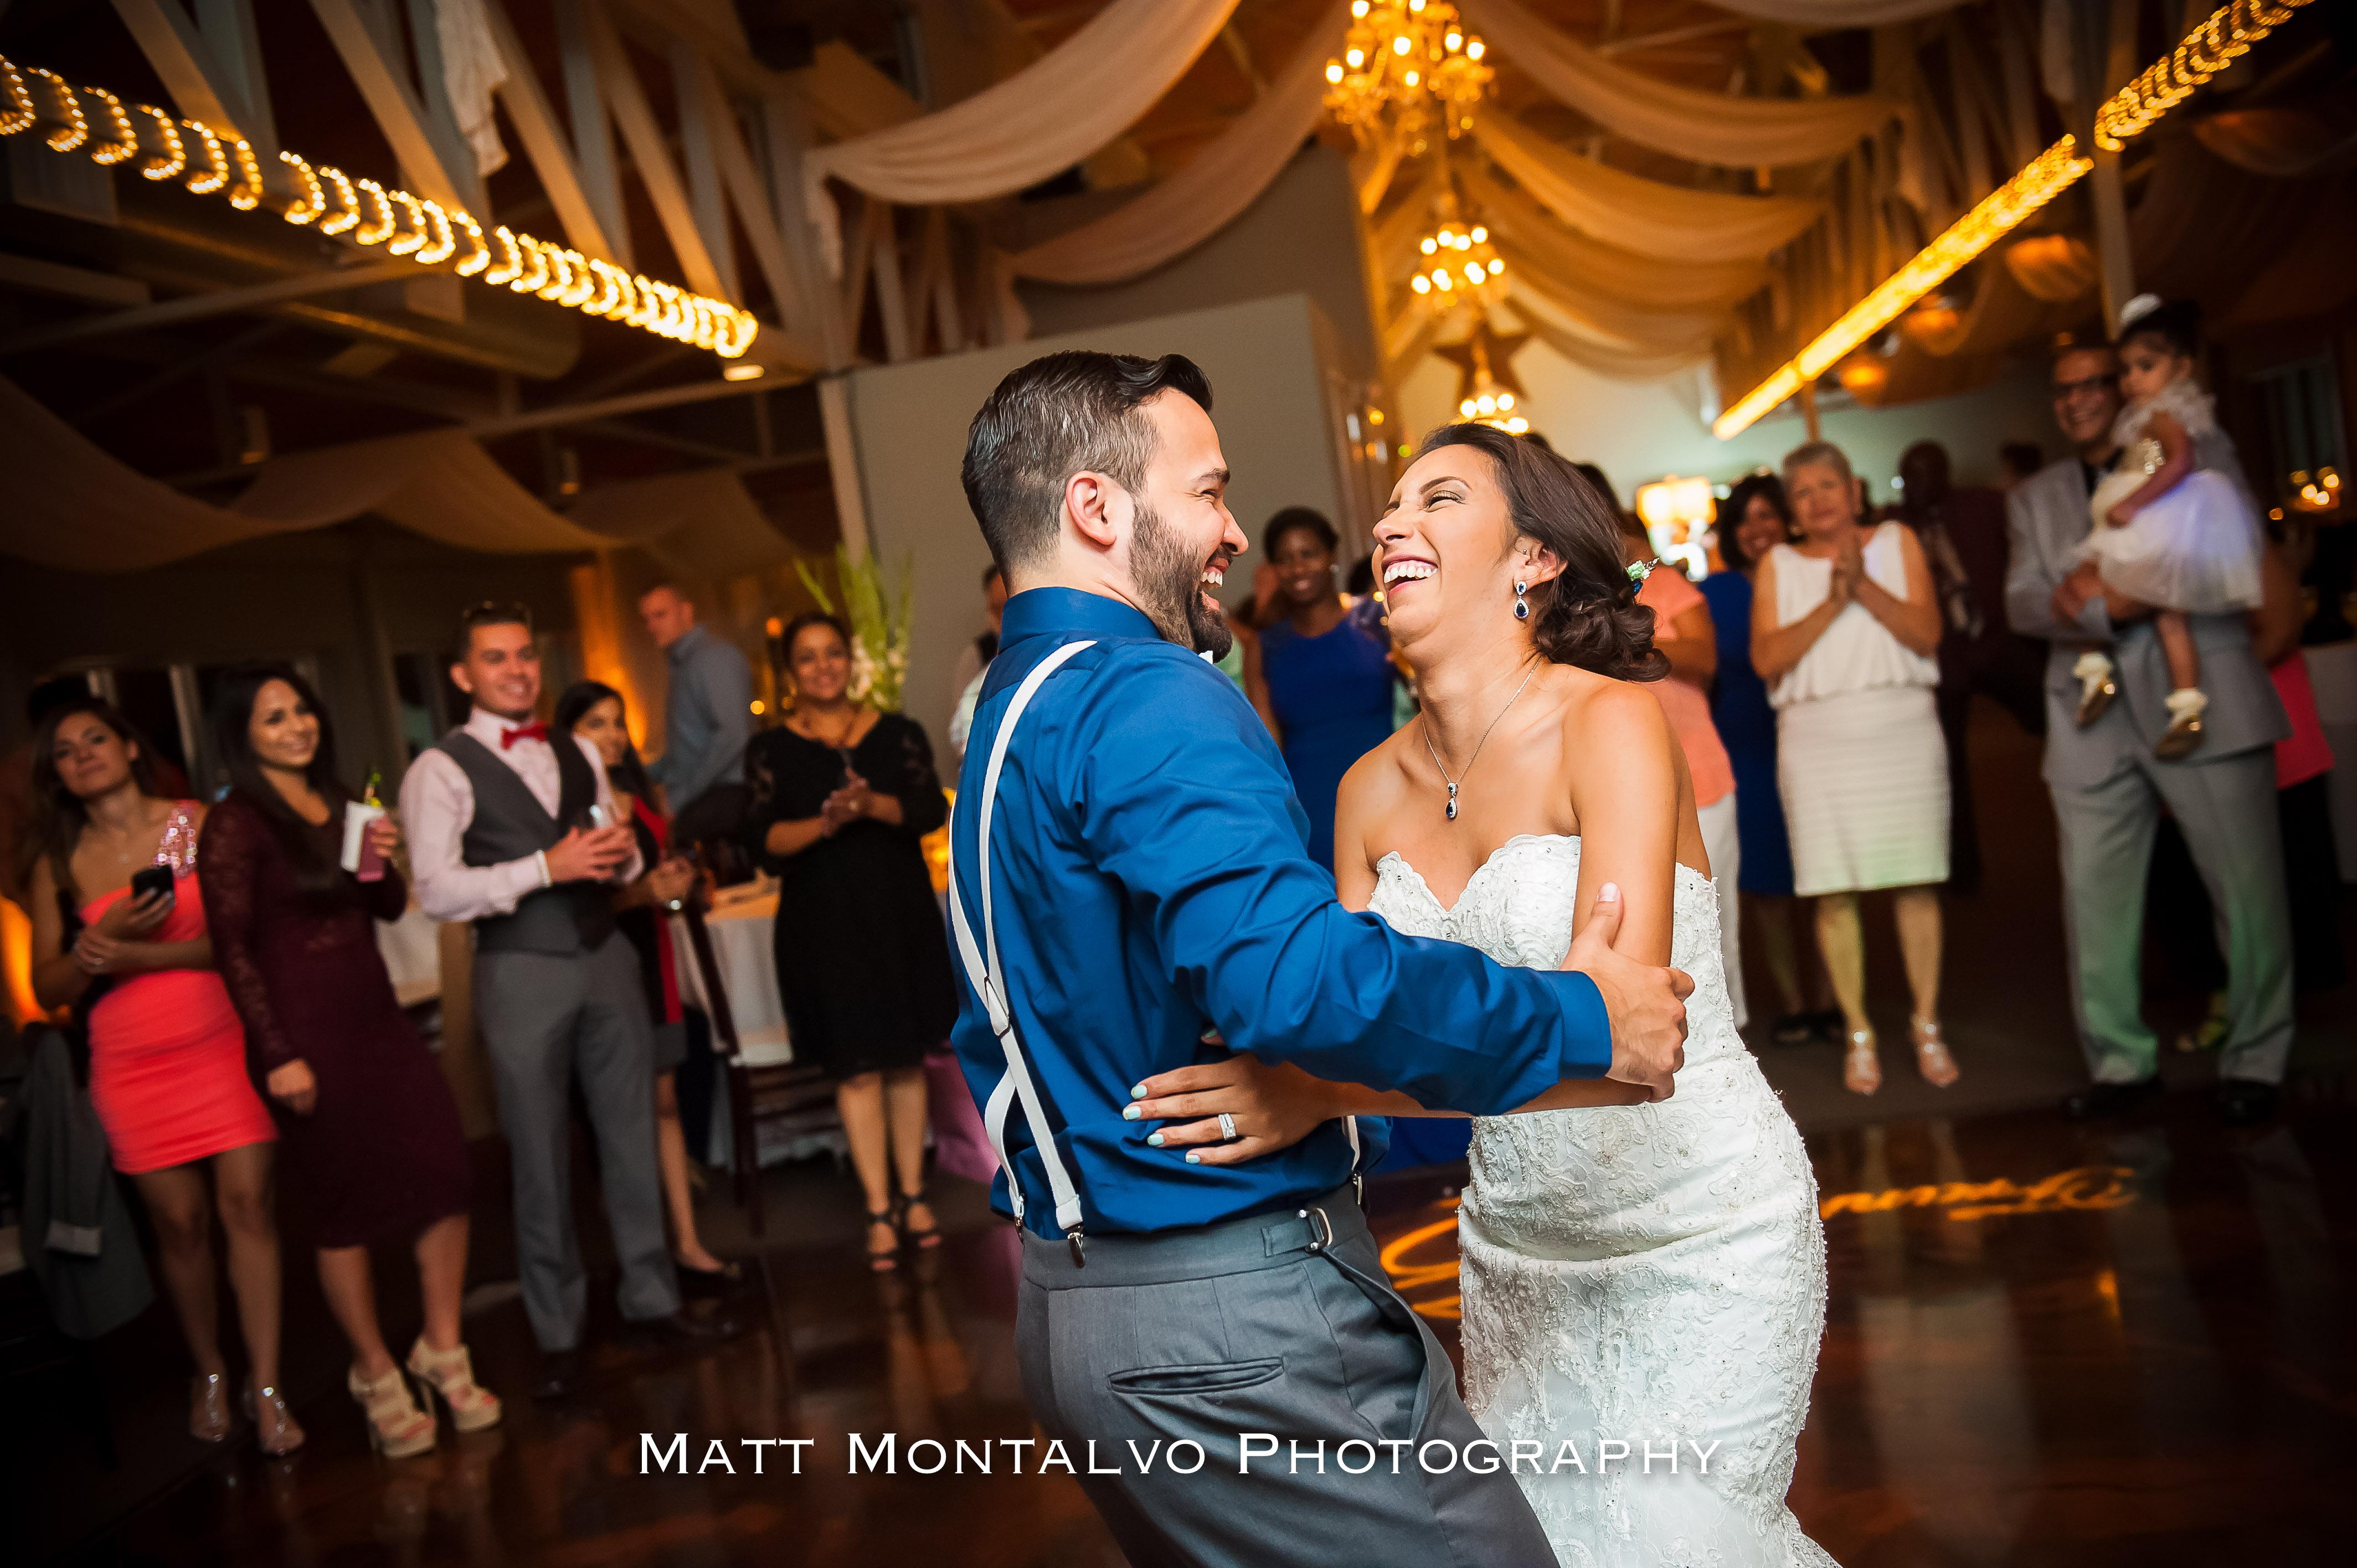 The terrace club wedding photography 44 matt montalvo for 44 the terrace